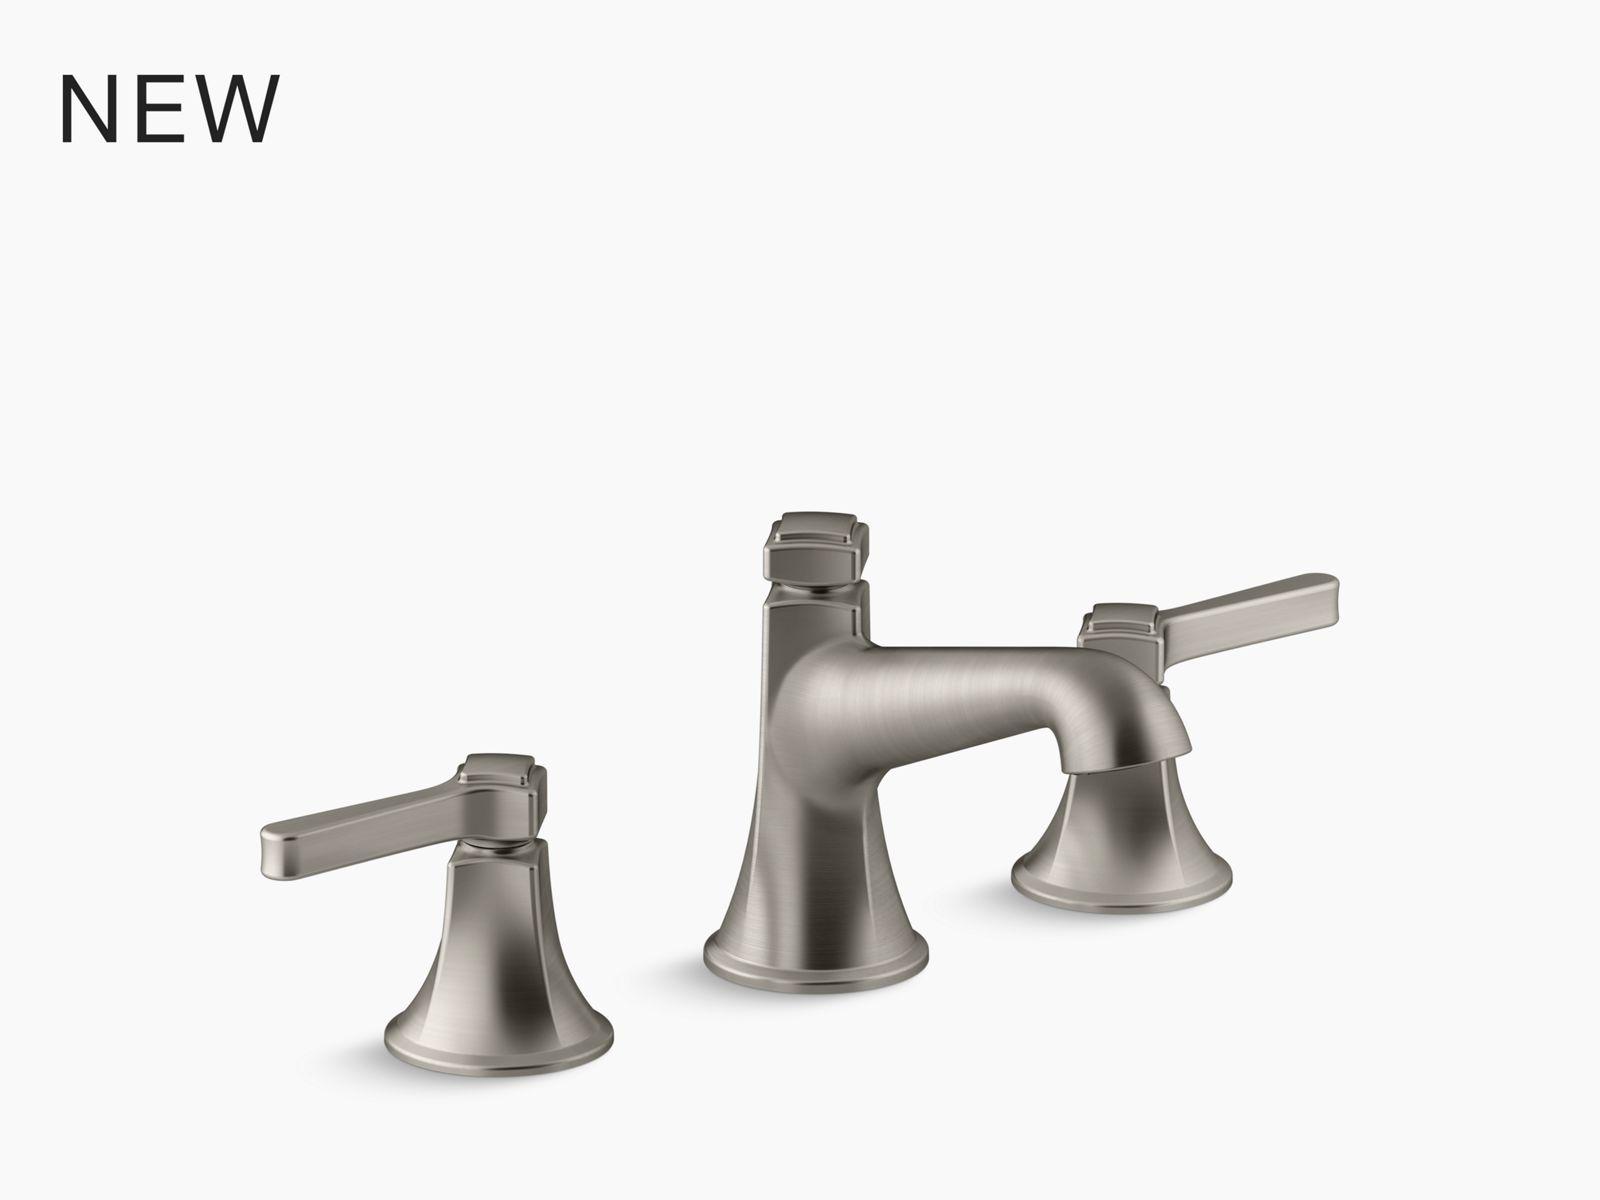 deck mount bath faucet with handshower